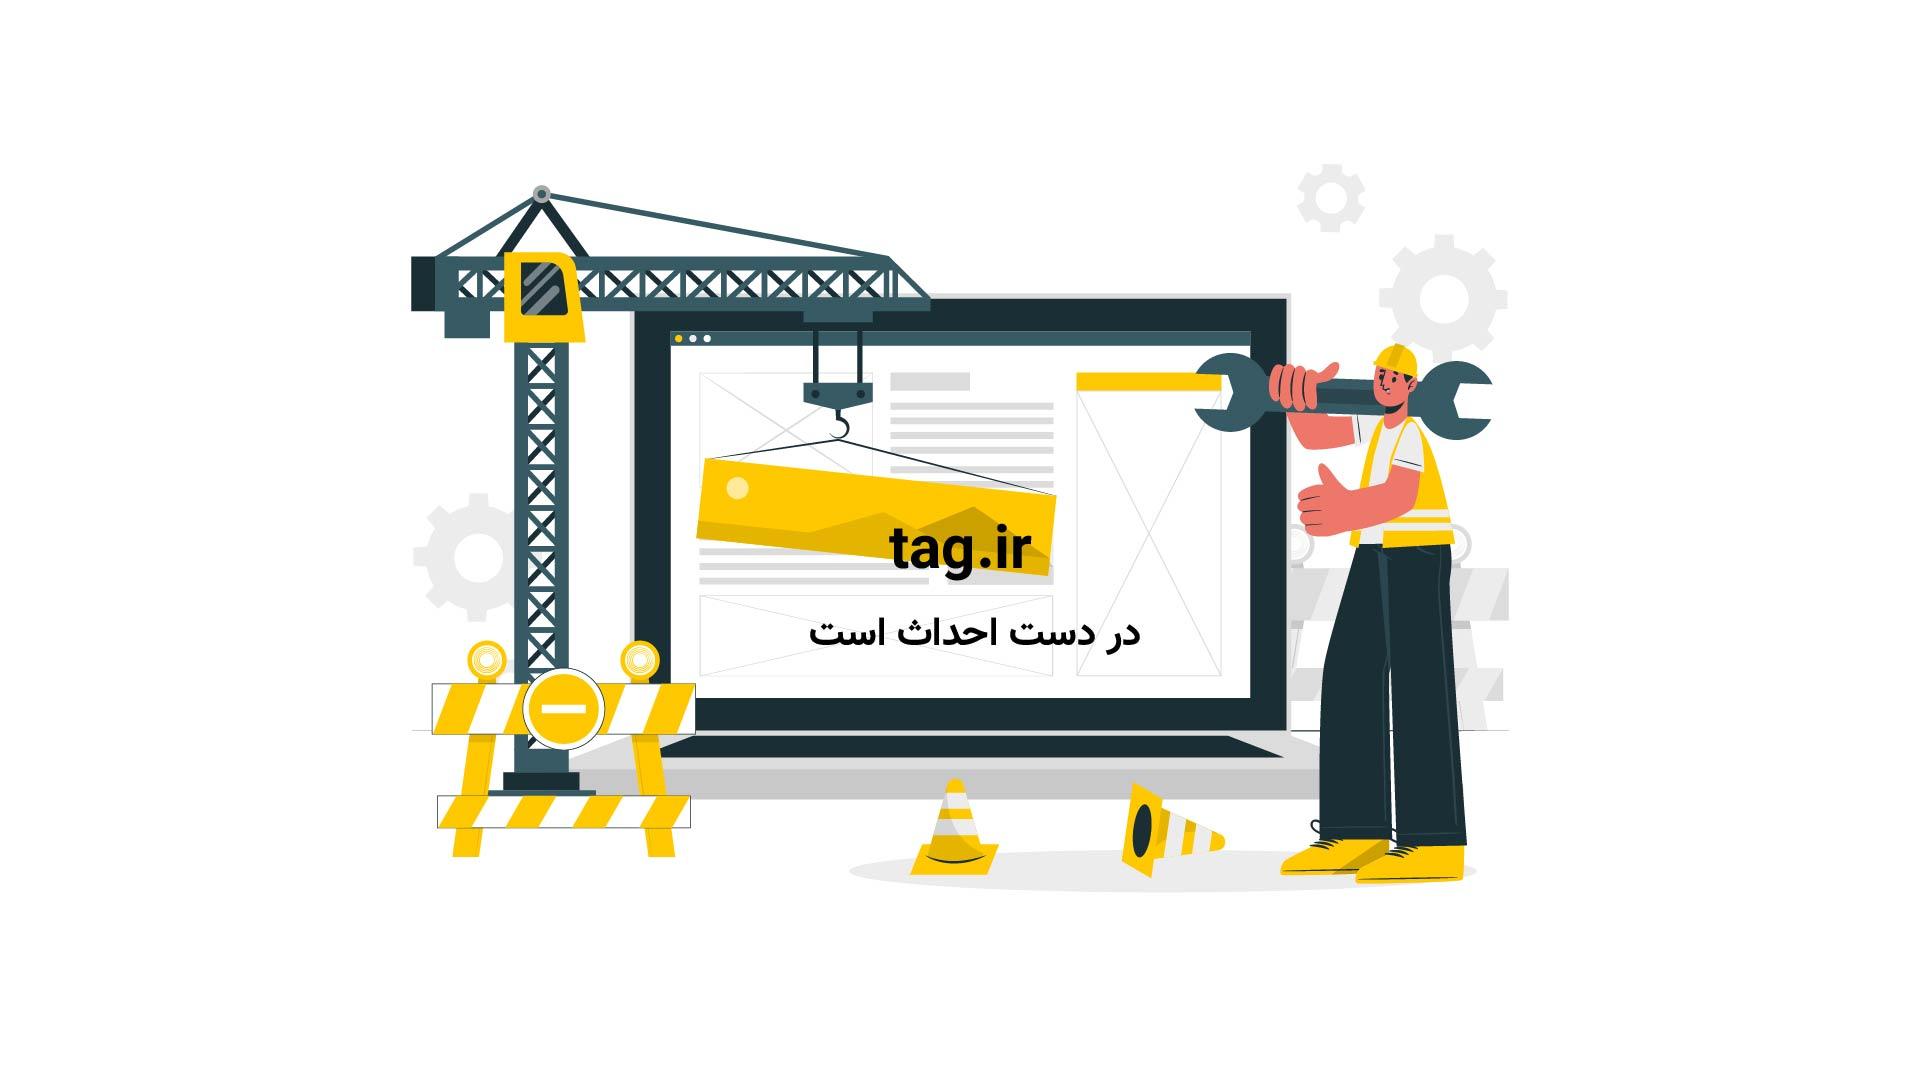 بلژیک ٤ مجارستان ٠؛ گزارش اختصاصی تگ یورو ٢٠١٦